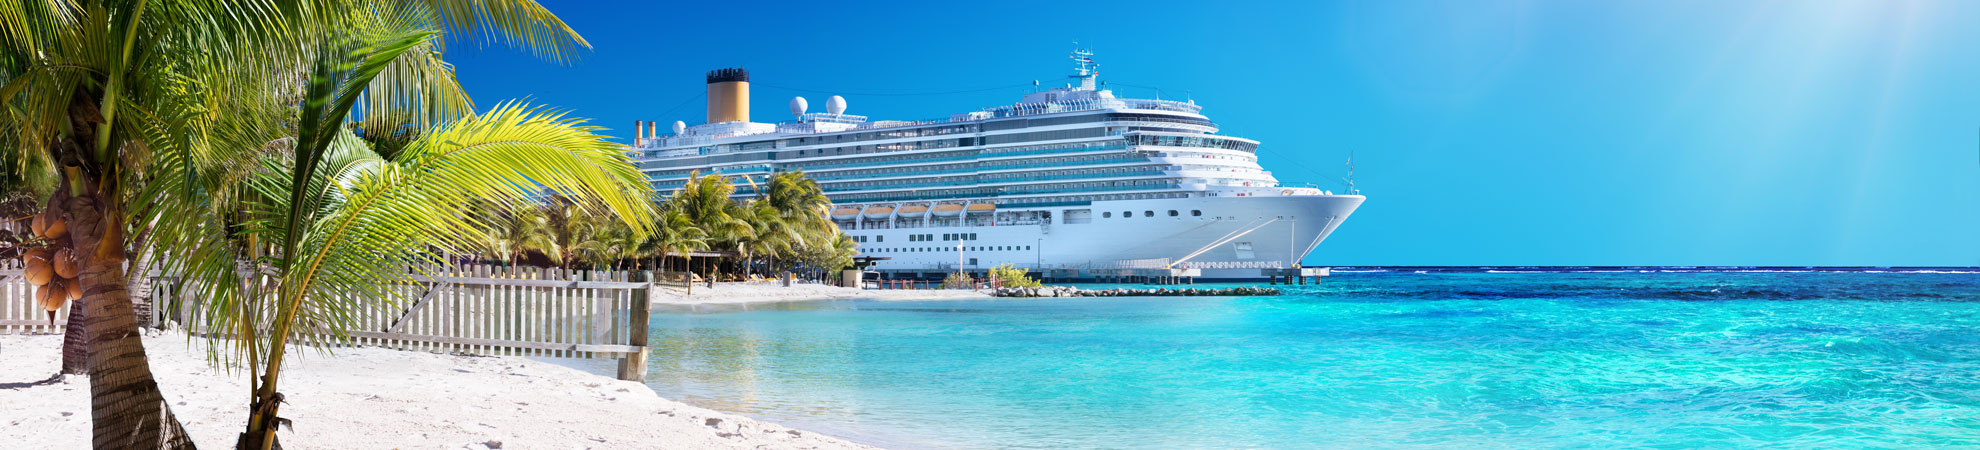 Aller en Polynésie en bateau